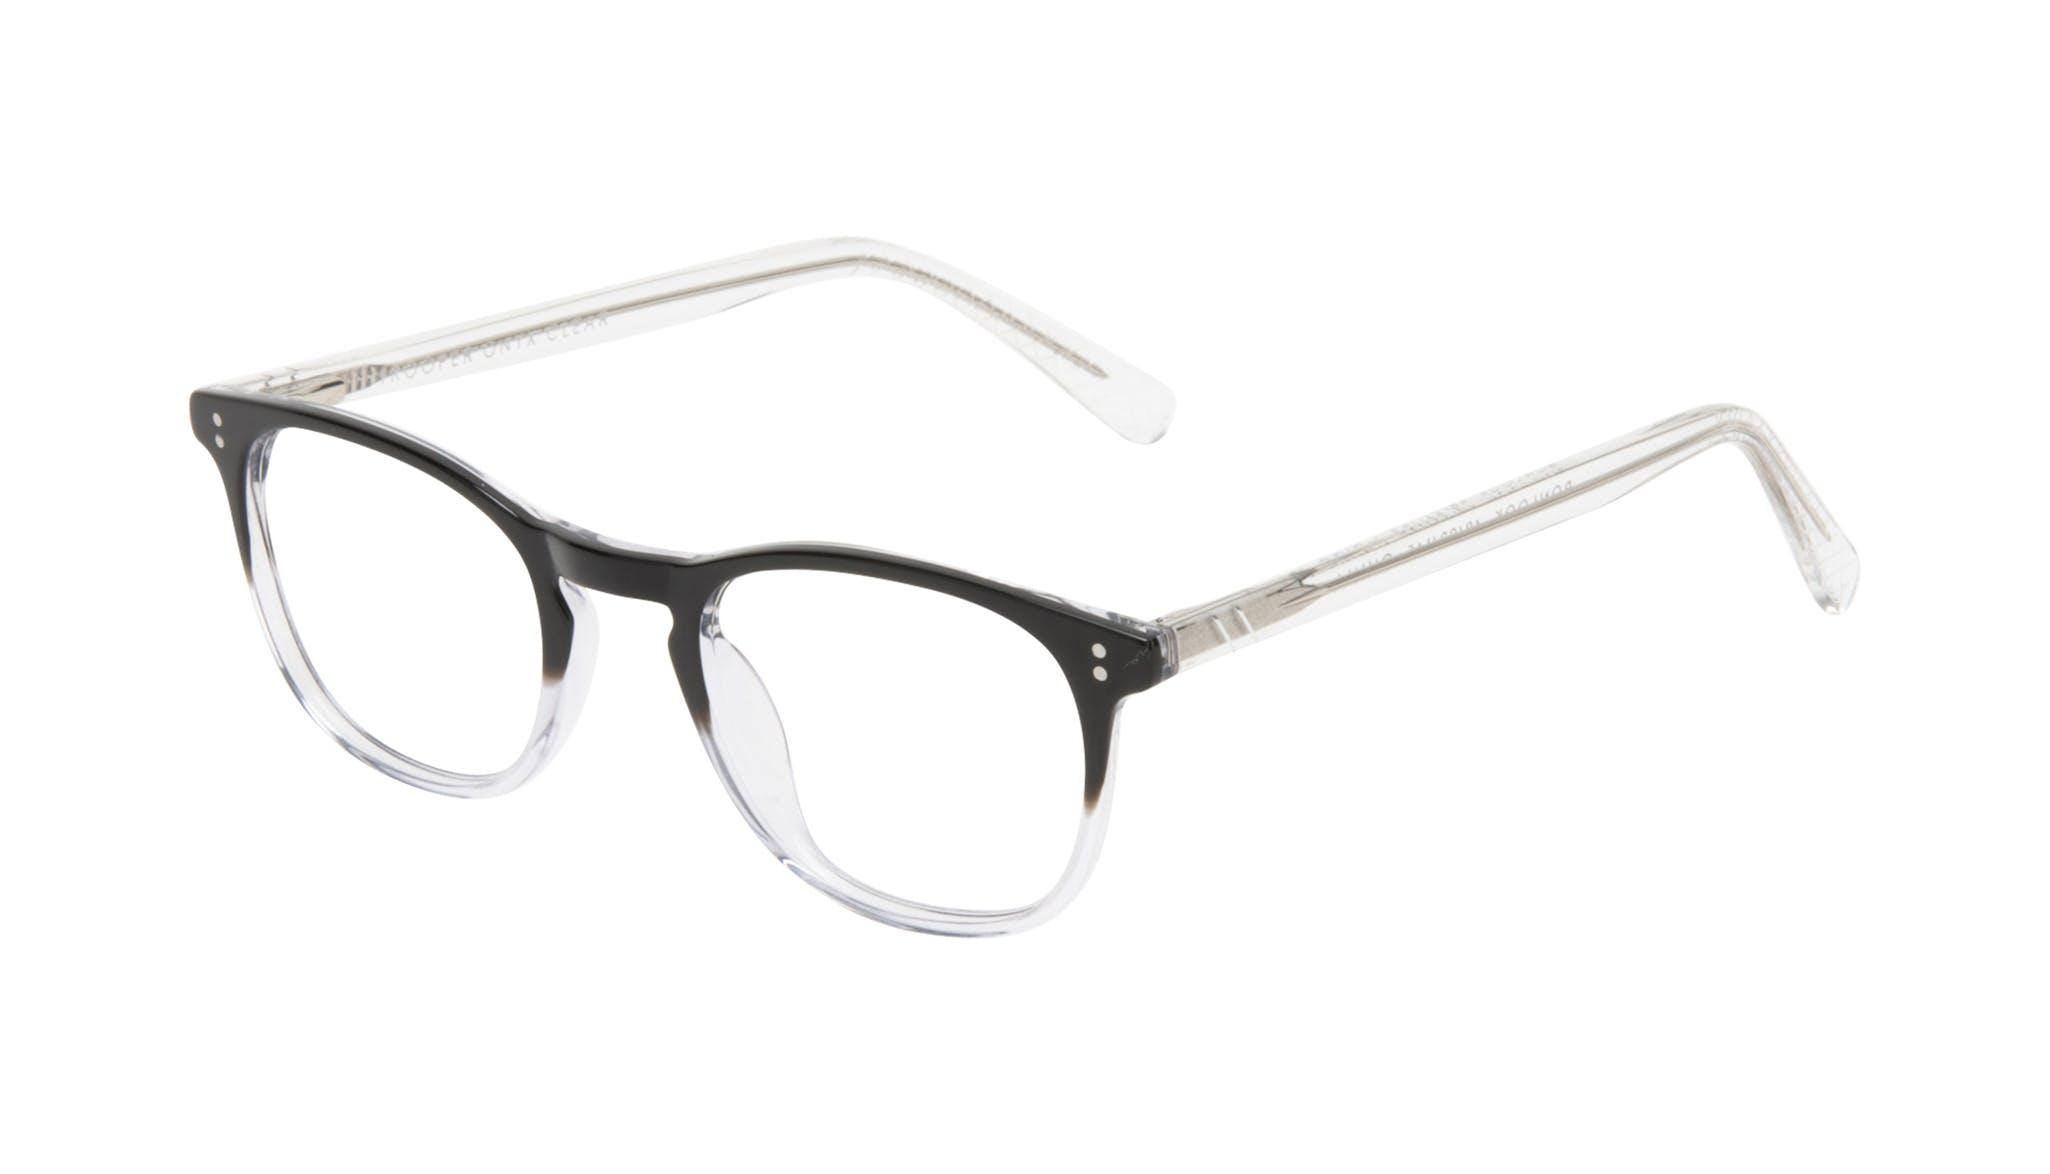 Affordable Fashion Glasses Round Eyeglasses Men Trooper Onyx Clear Tilt